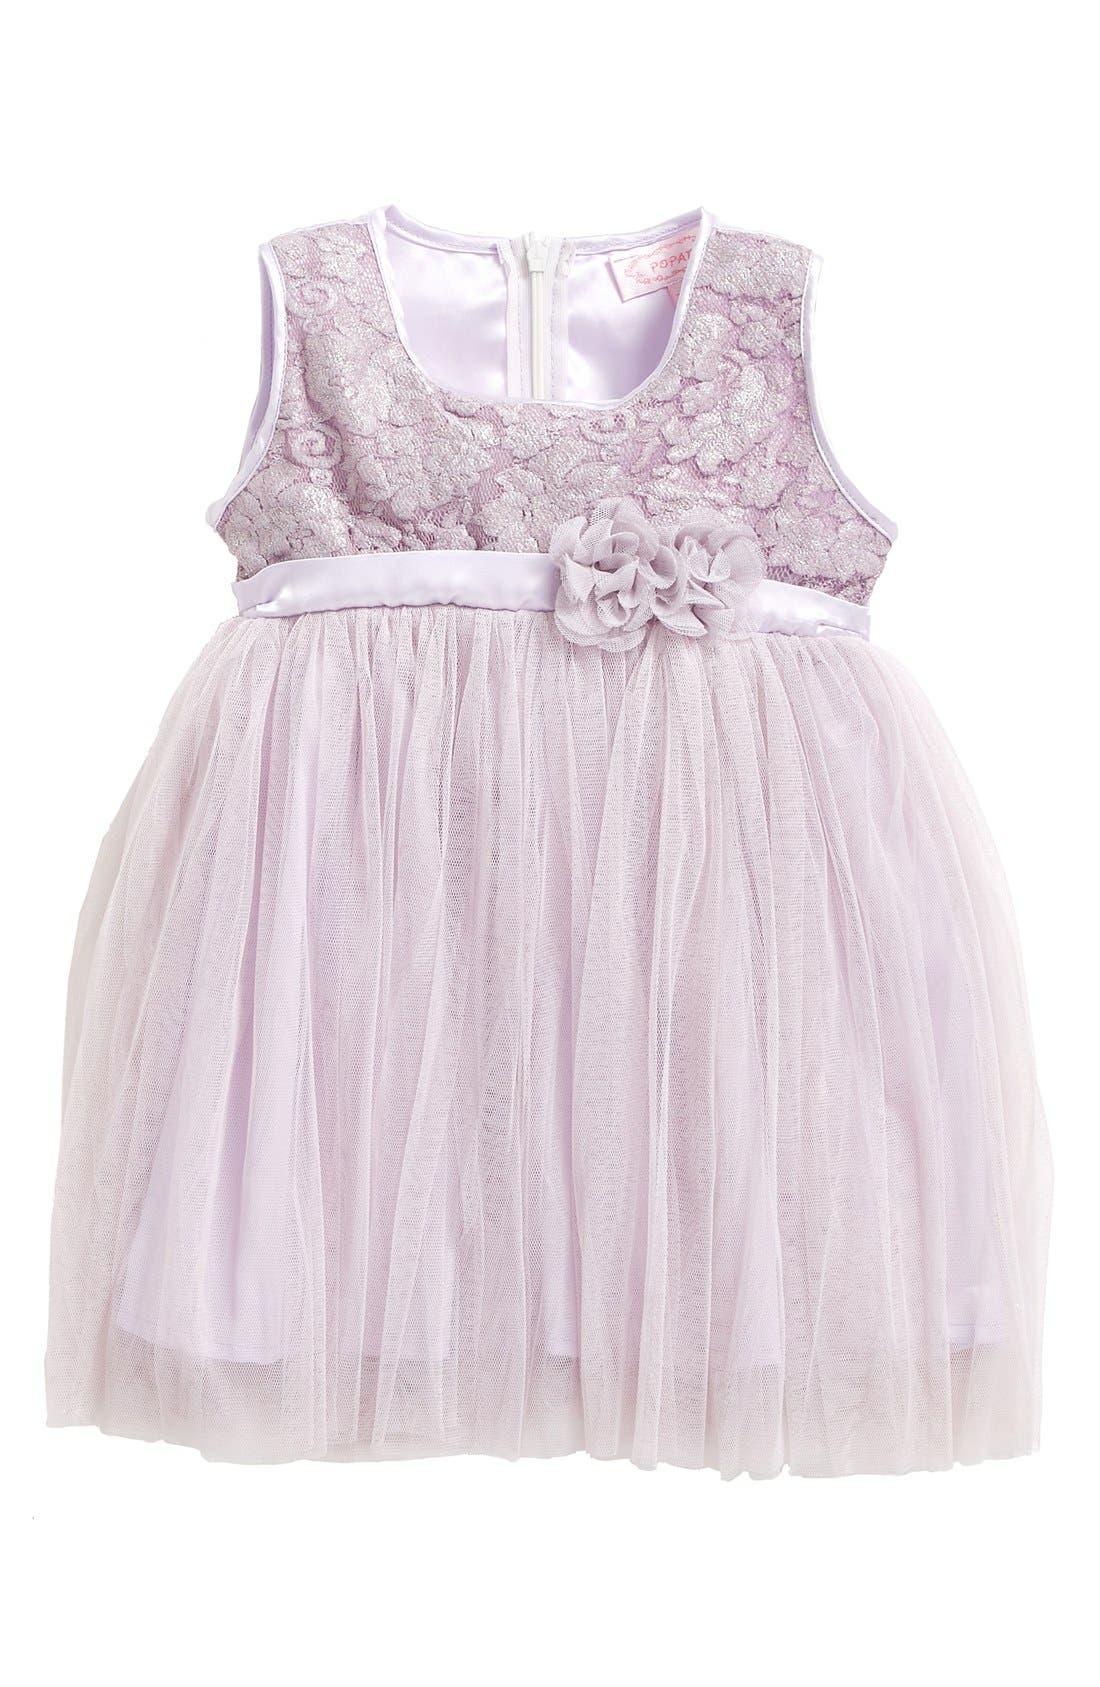 Alternate Image 1 Selected - Popatu Empire Waist Lace Dress (Baby Girls)